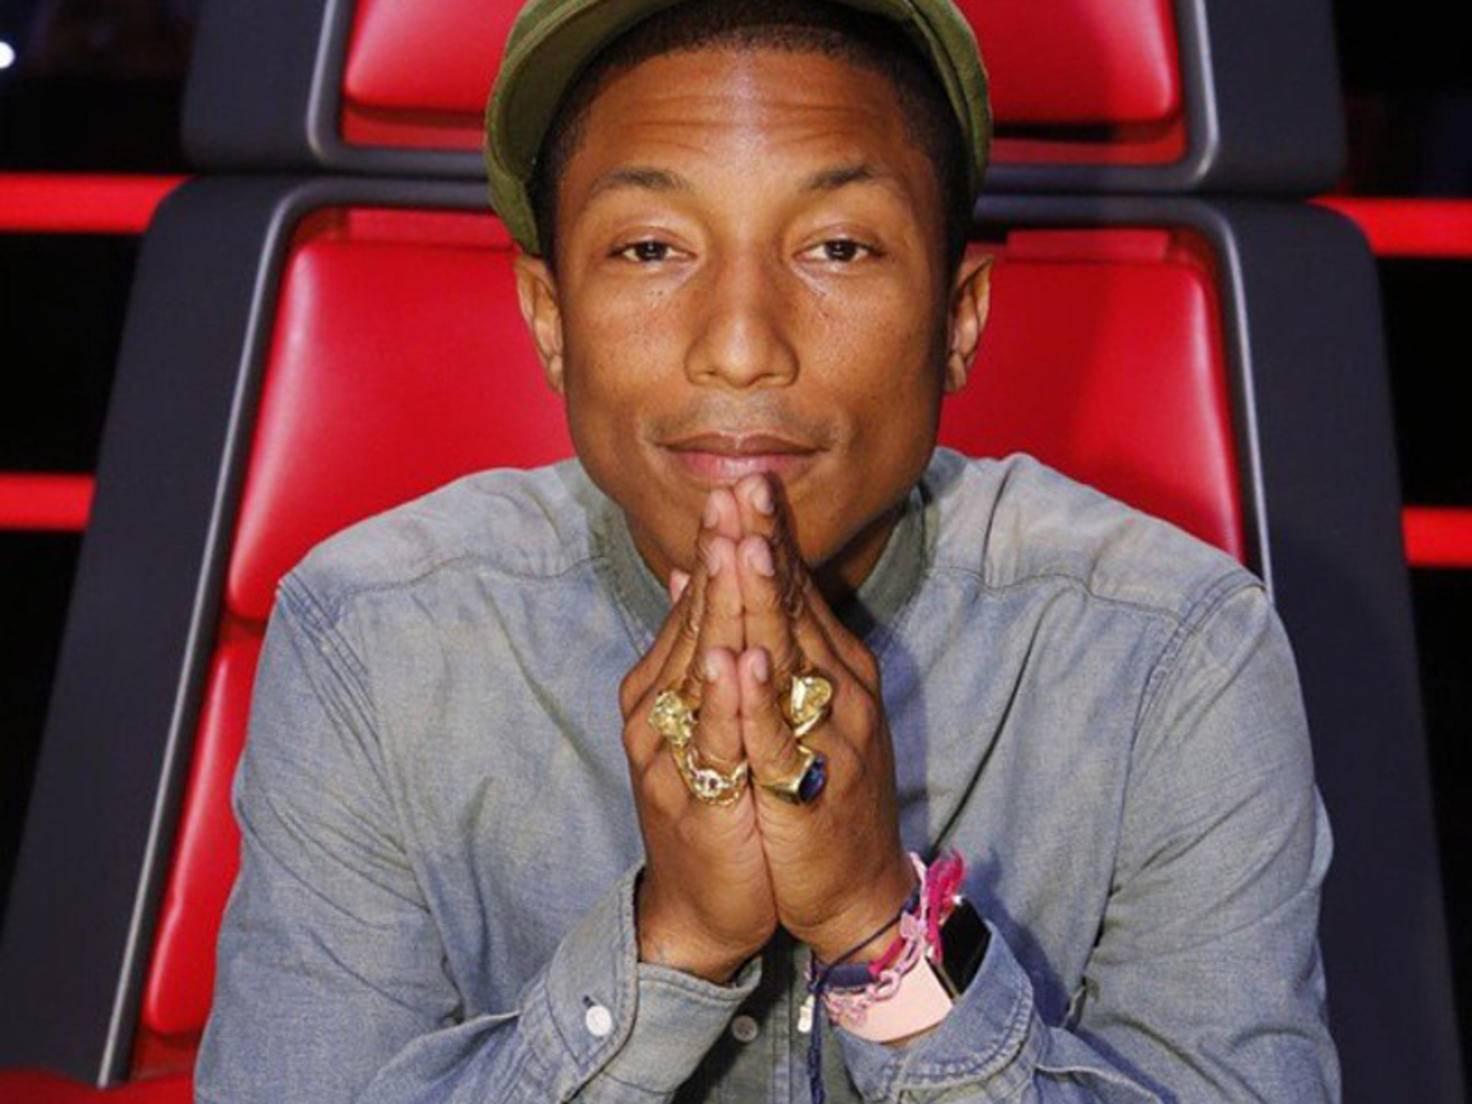 Pharrell mit Apple Watch